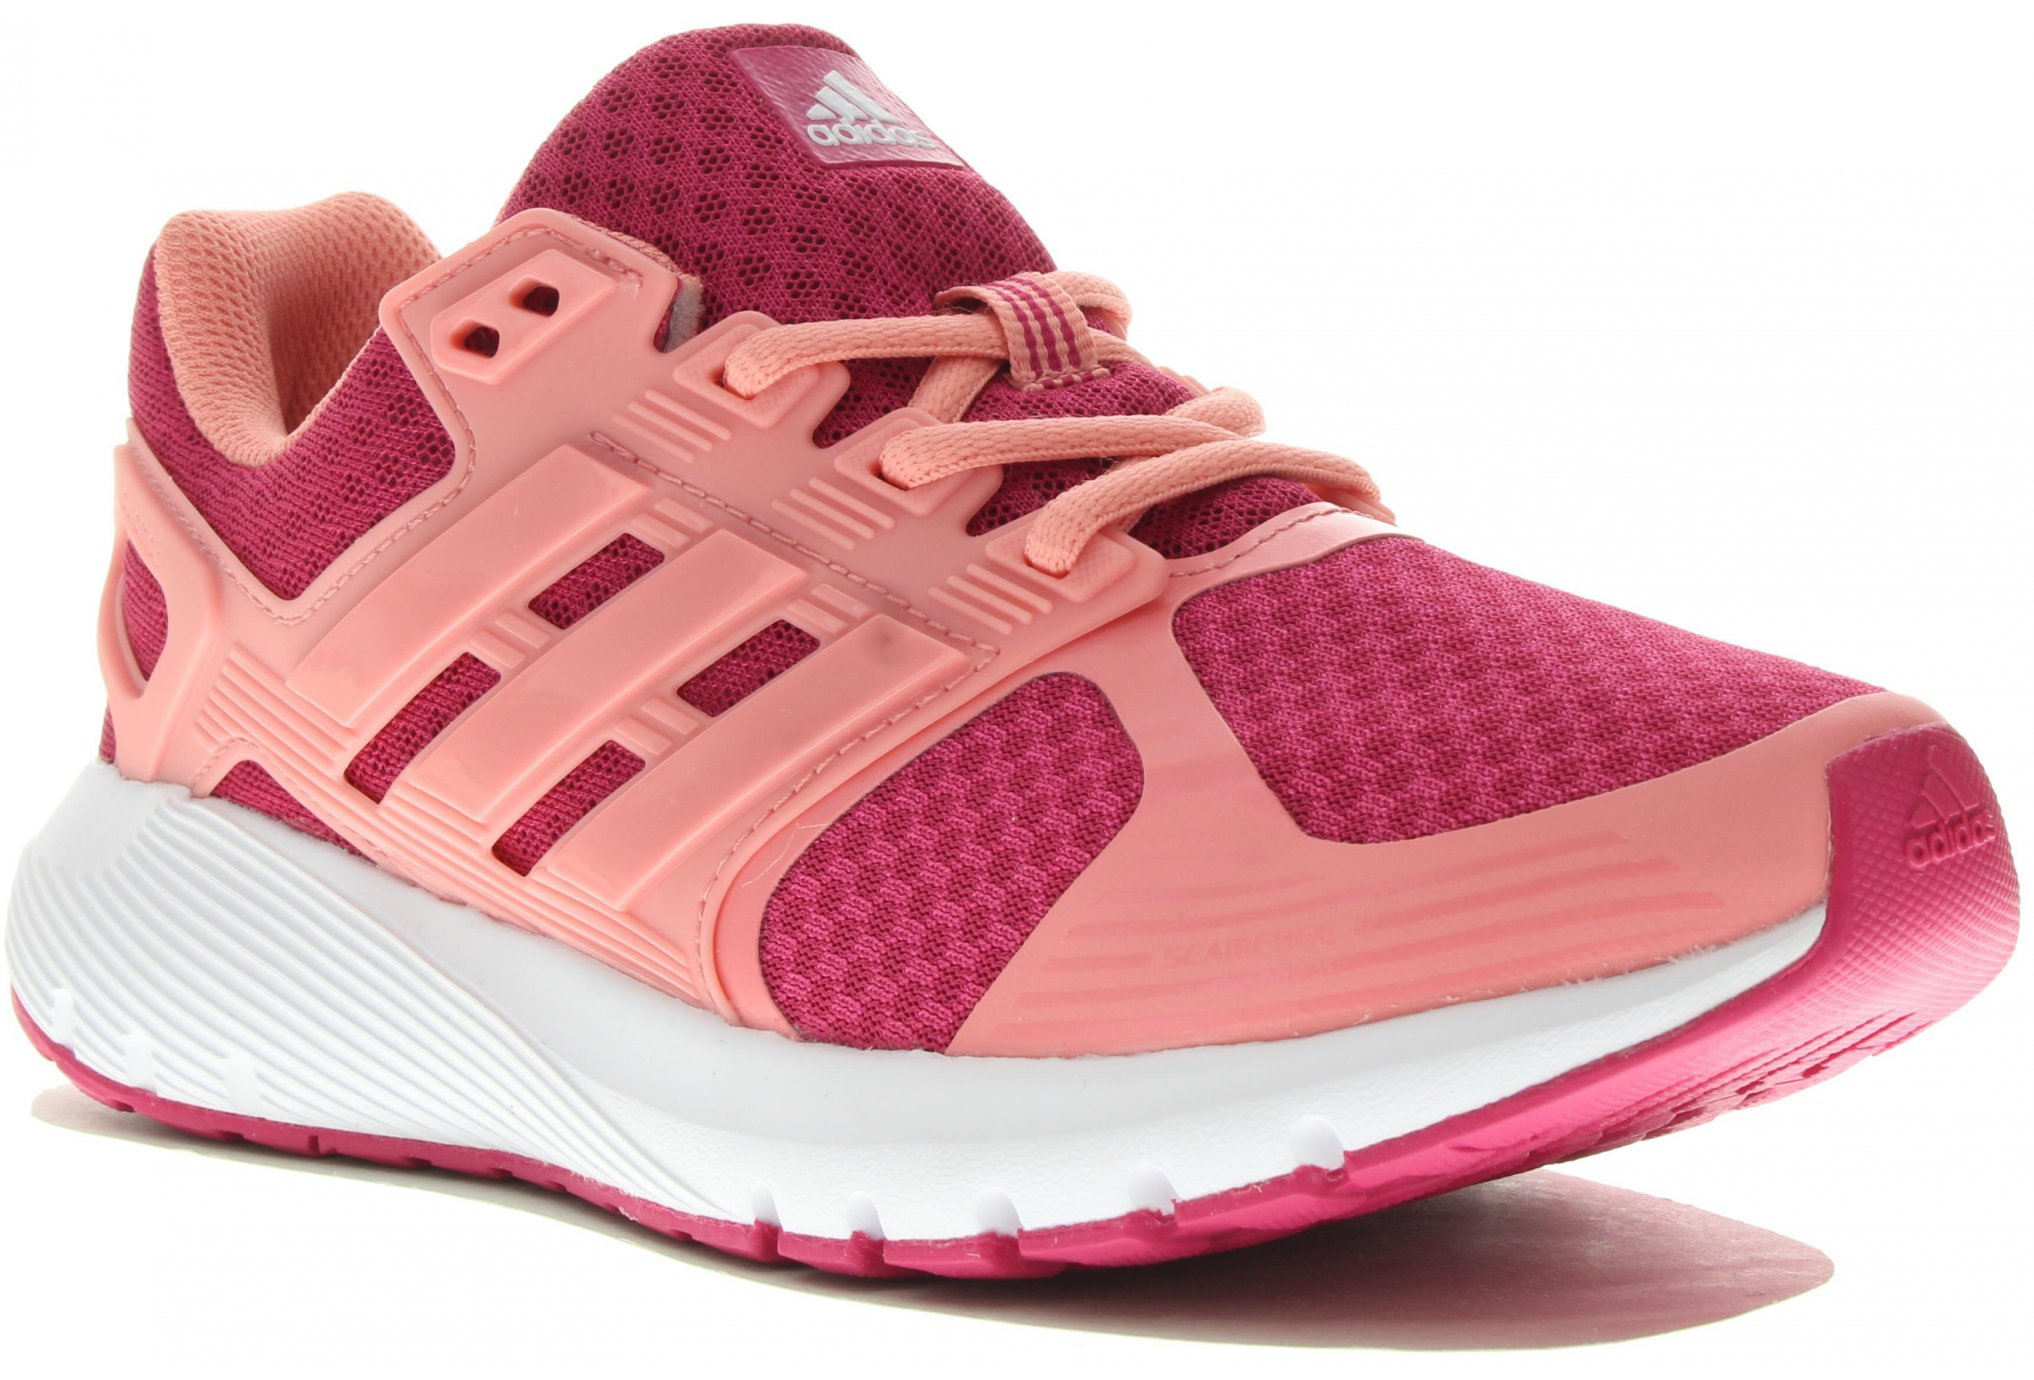 adidas Duramo 8 Junior Chaussures running femme